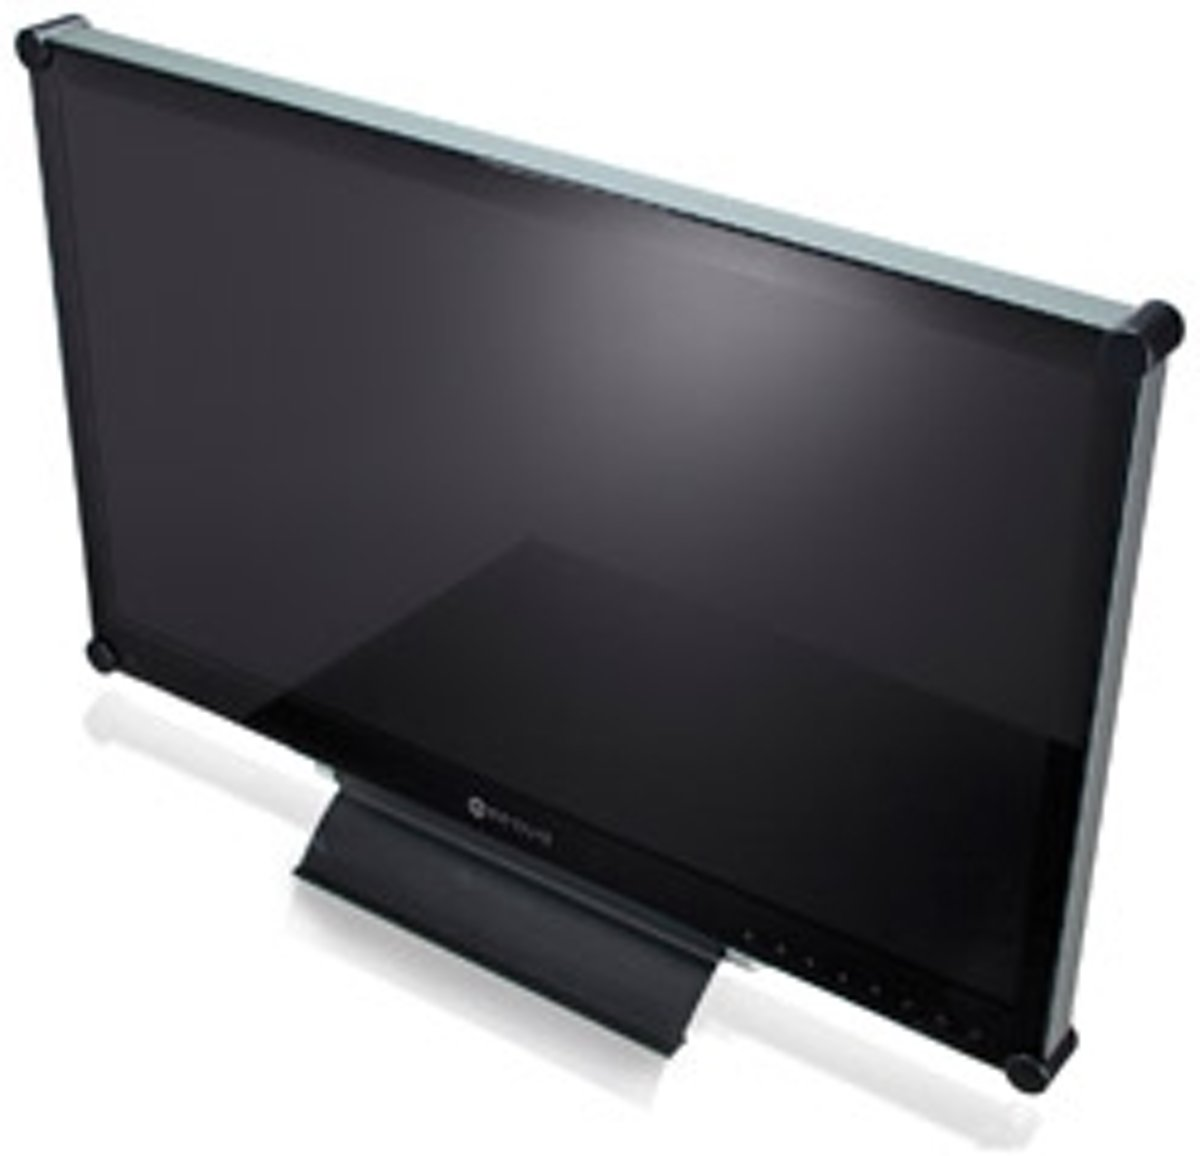 Neovo X24 - Monitor